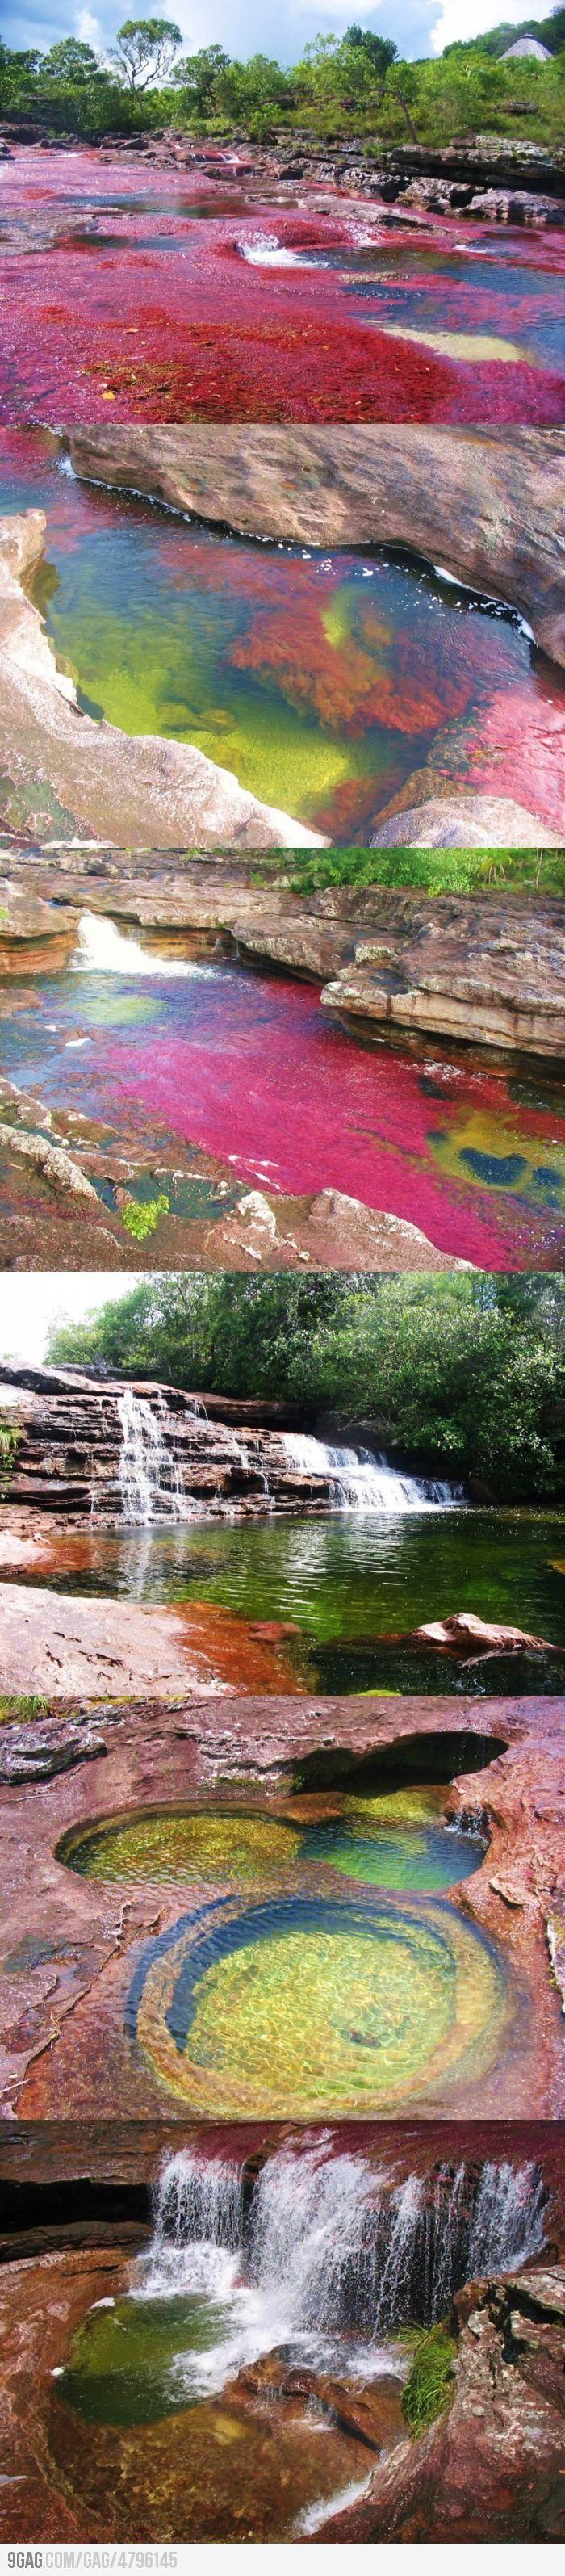 "River of Five Colors/ Caño Cristales in Columbia.Caño Cristales is a Colombian river located in the Serrania de la Macarena, province of Meta. aka ""The Liquid Rainbow"" or even ""The Most Beautiful River in the World"""